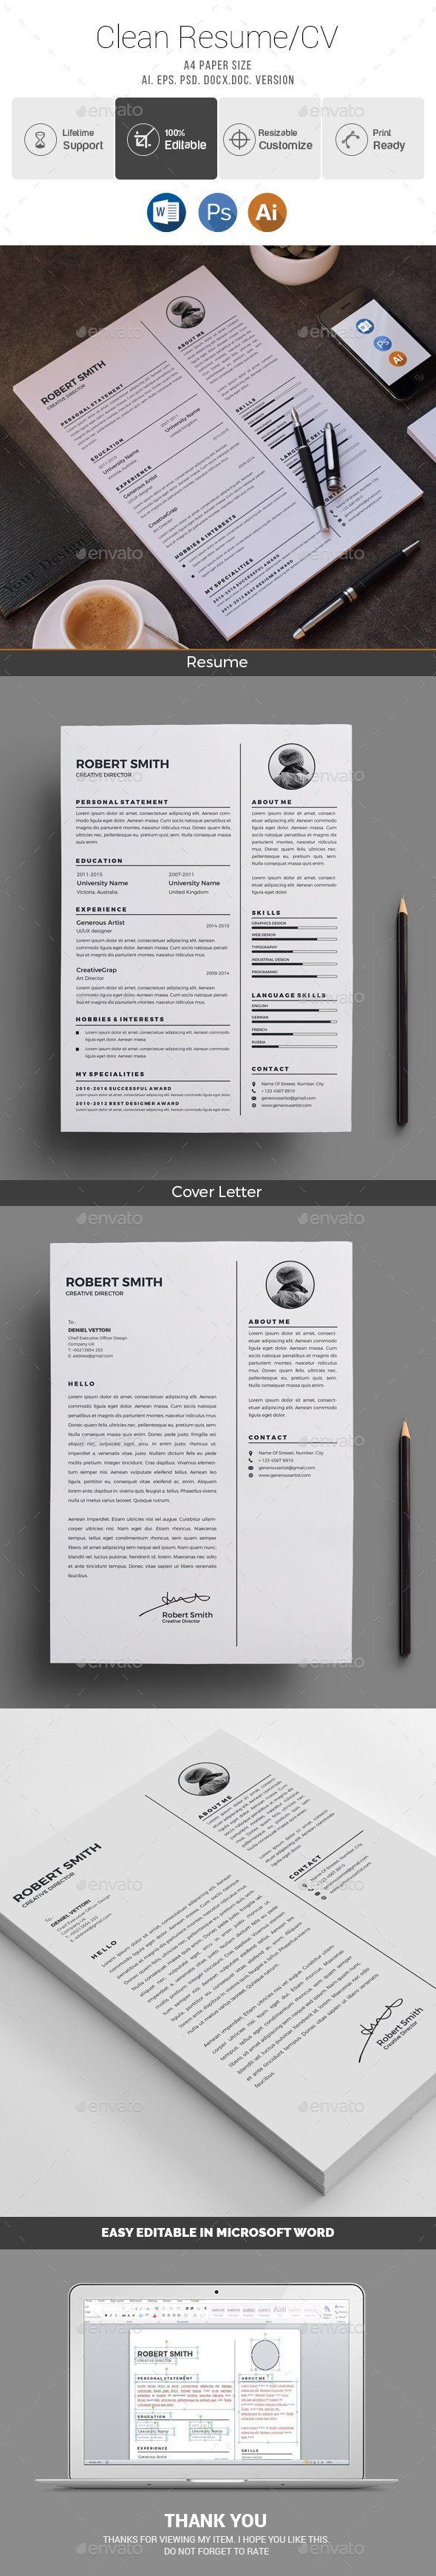 Resume / CV Template PSD, Vector EPS, AI Illustrator, MS Word